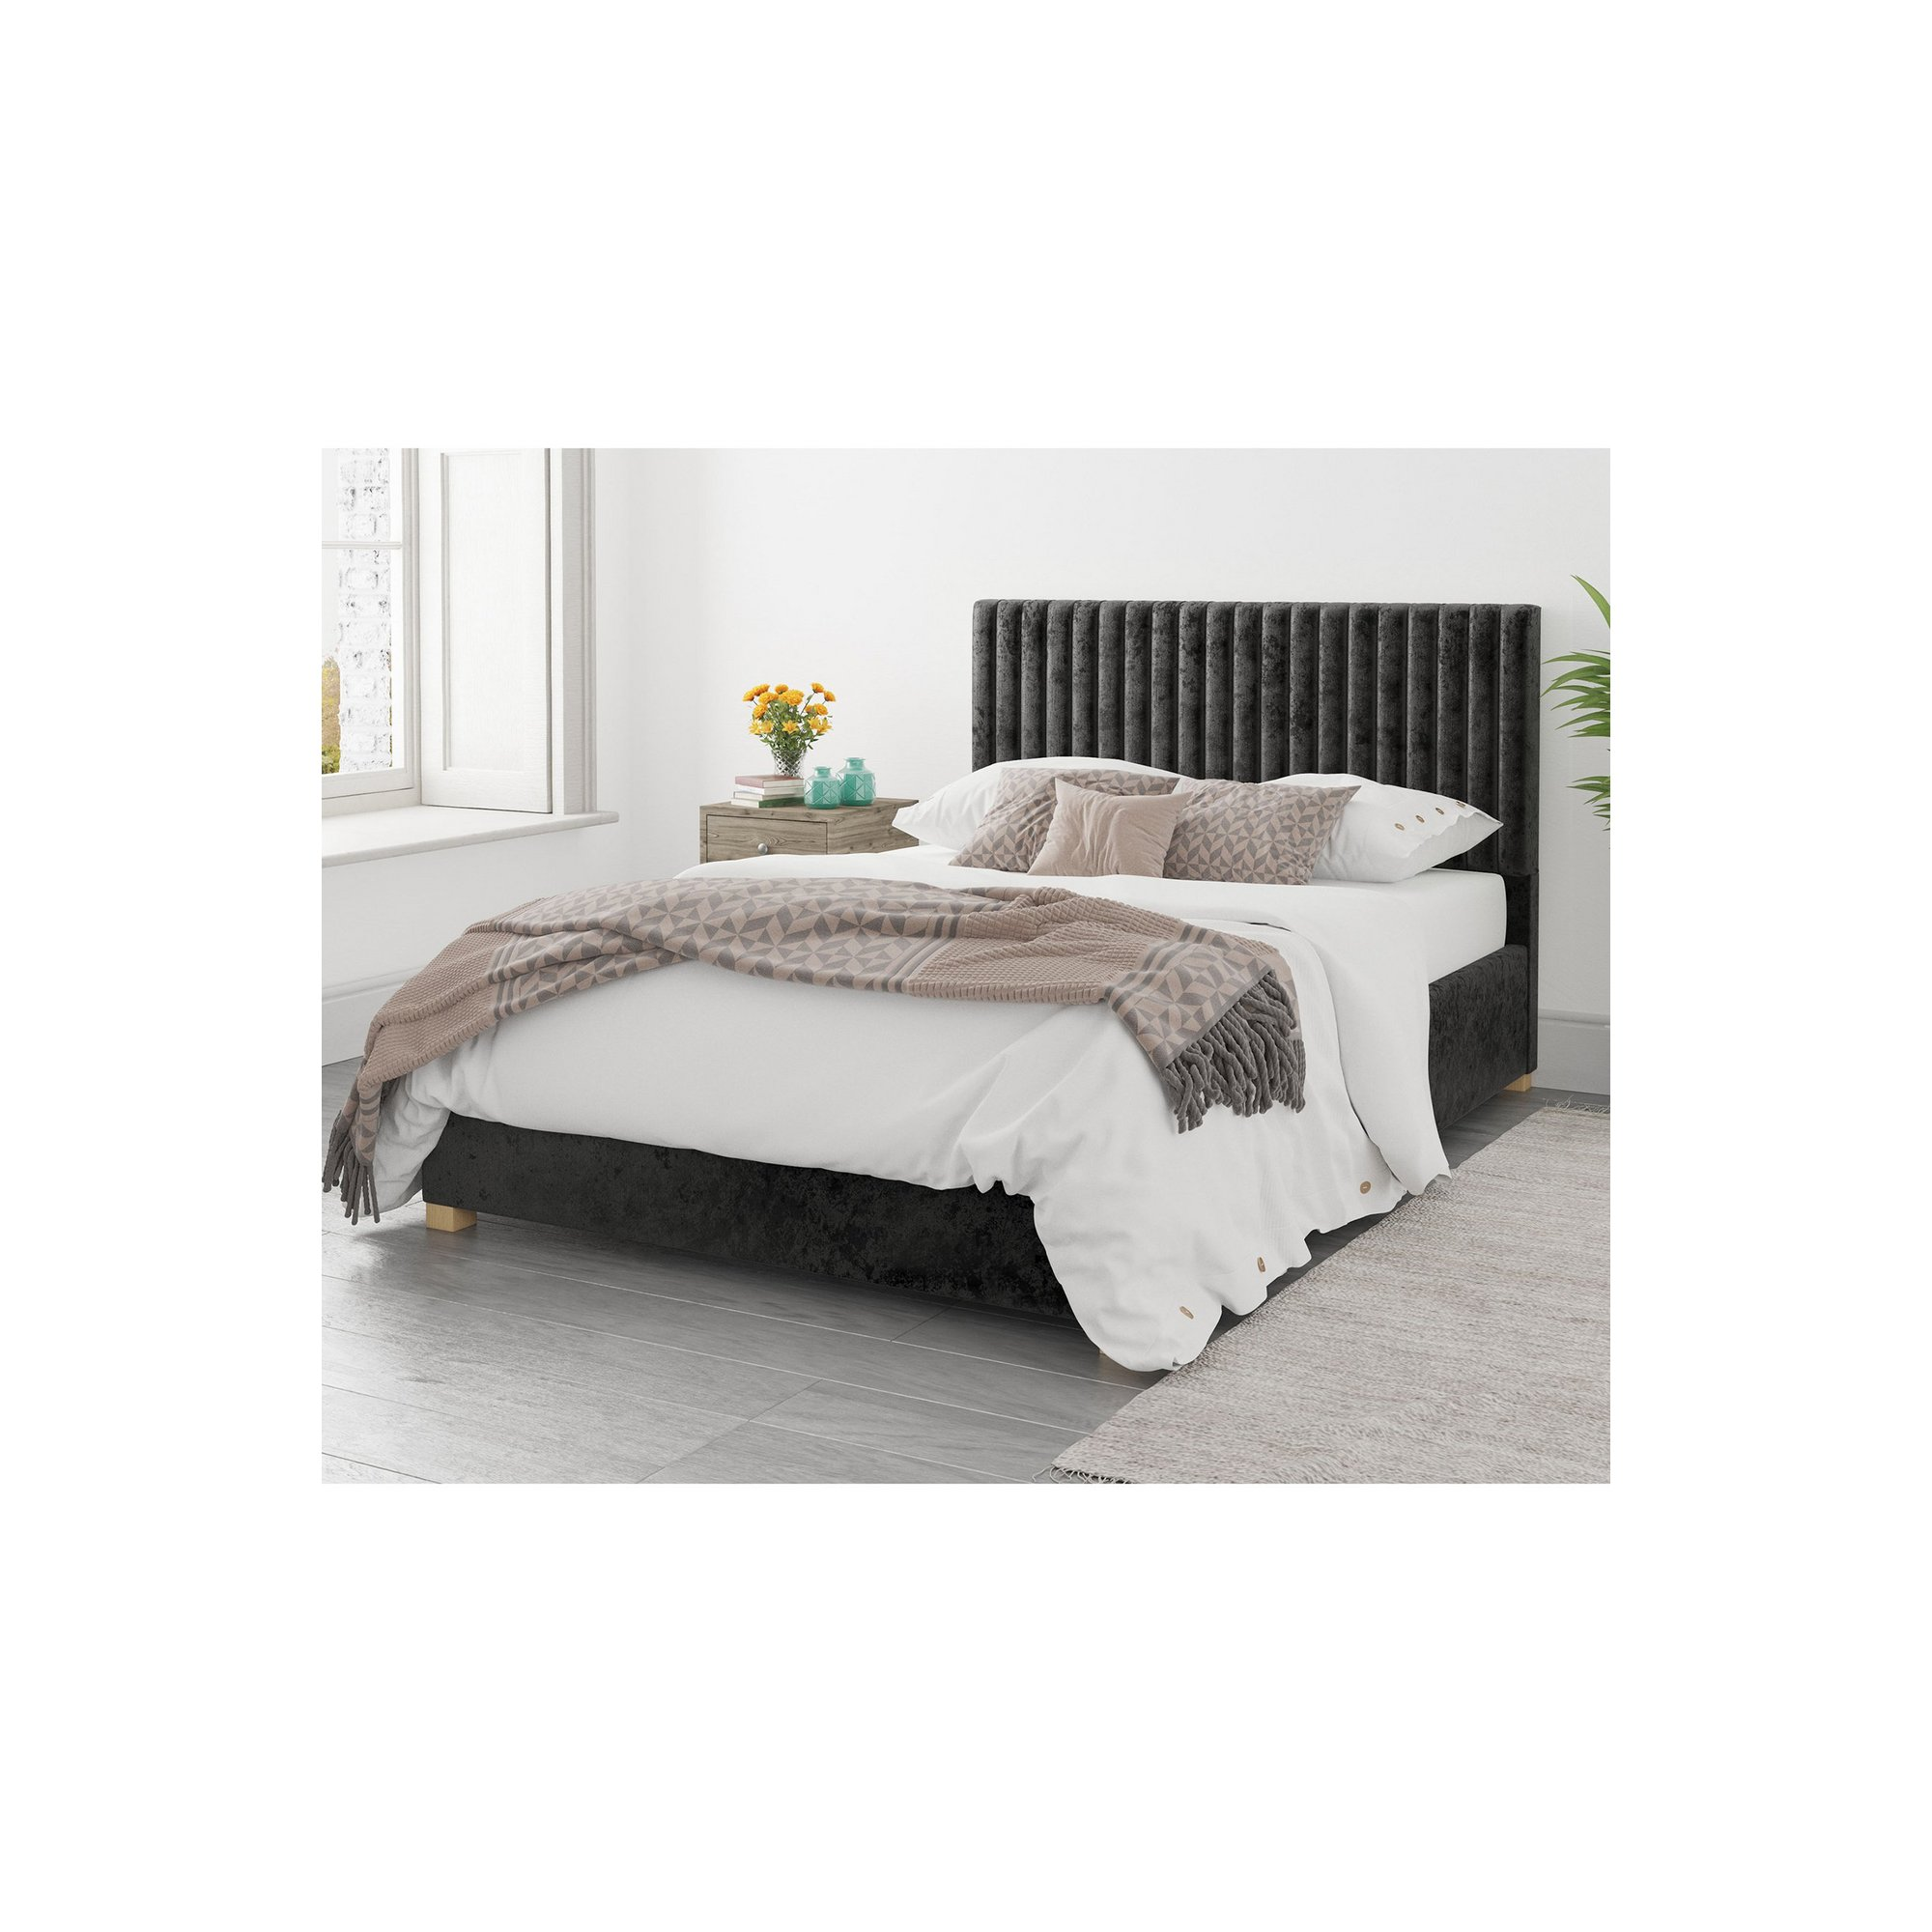 Image of Aspire Grant Ottoman Bed